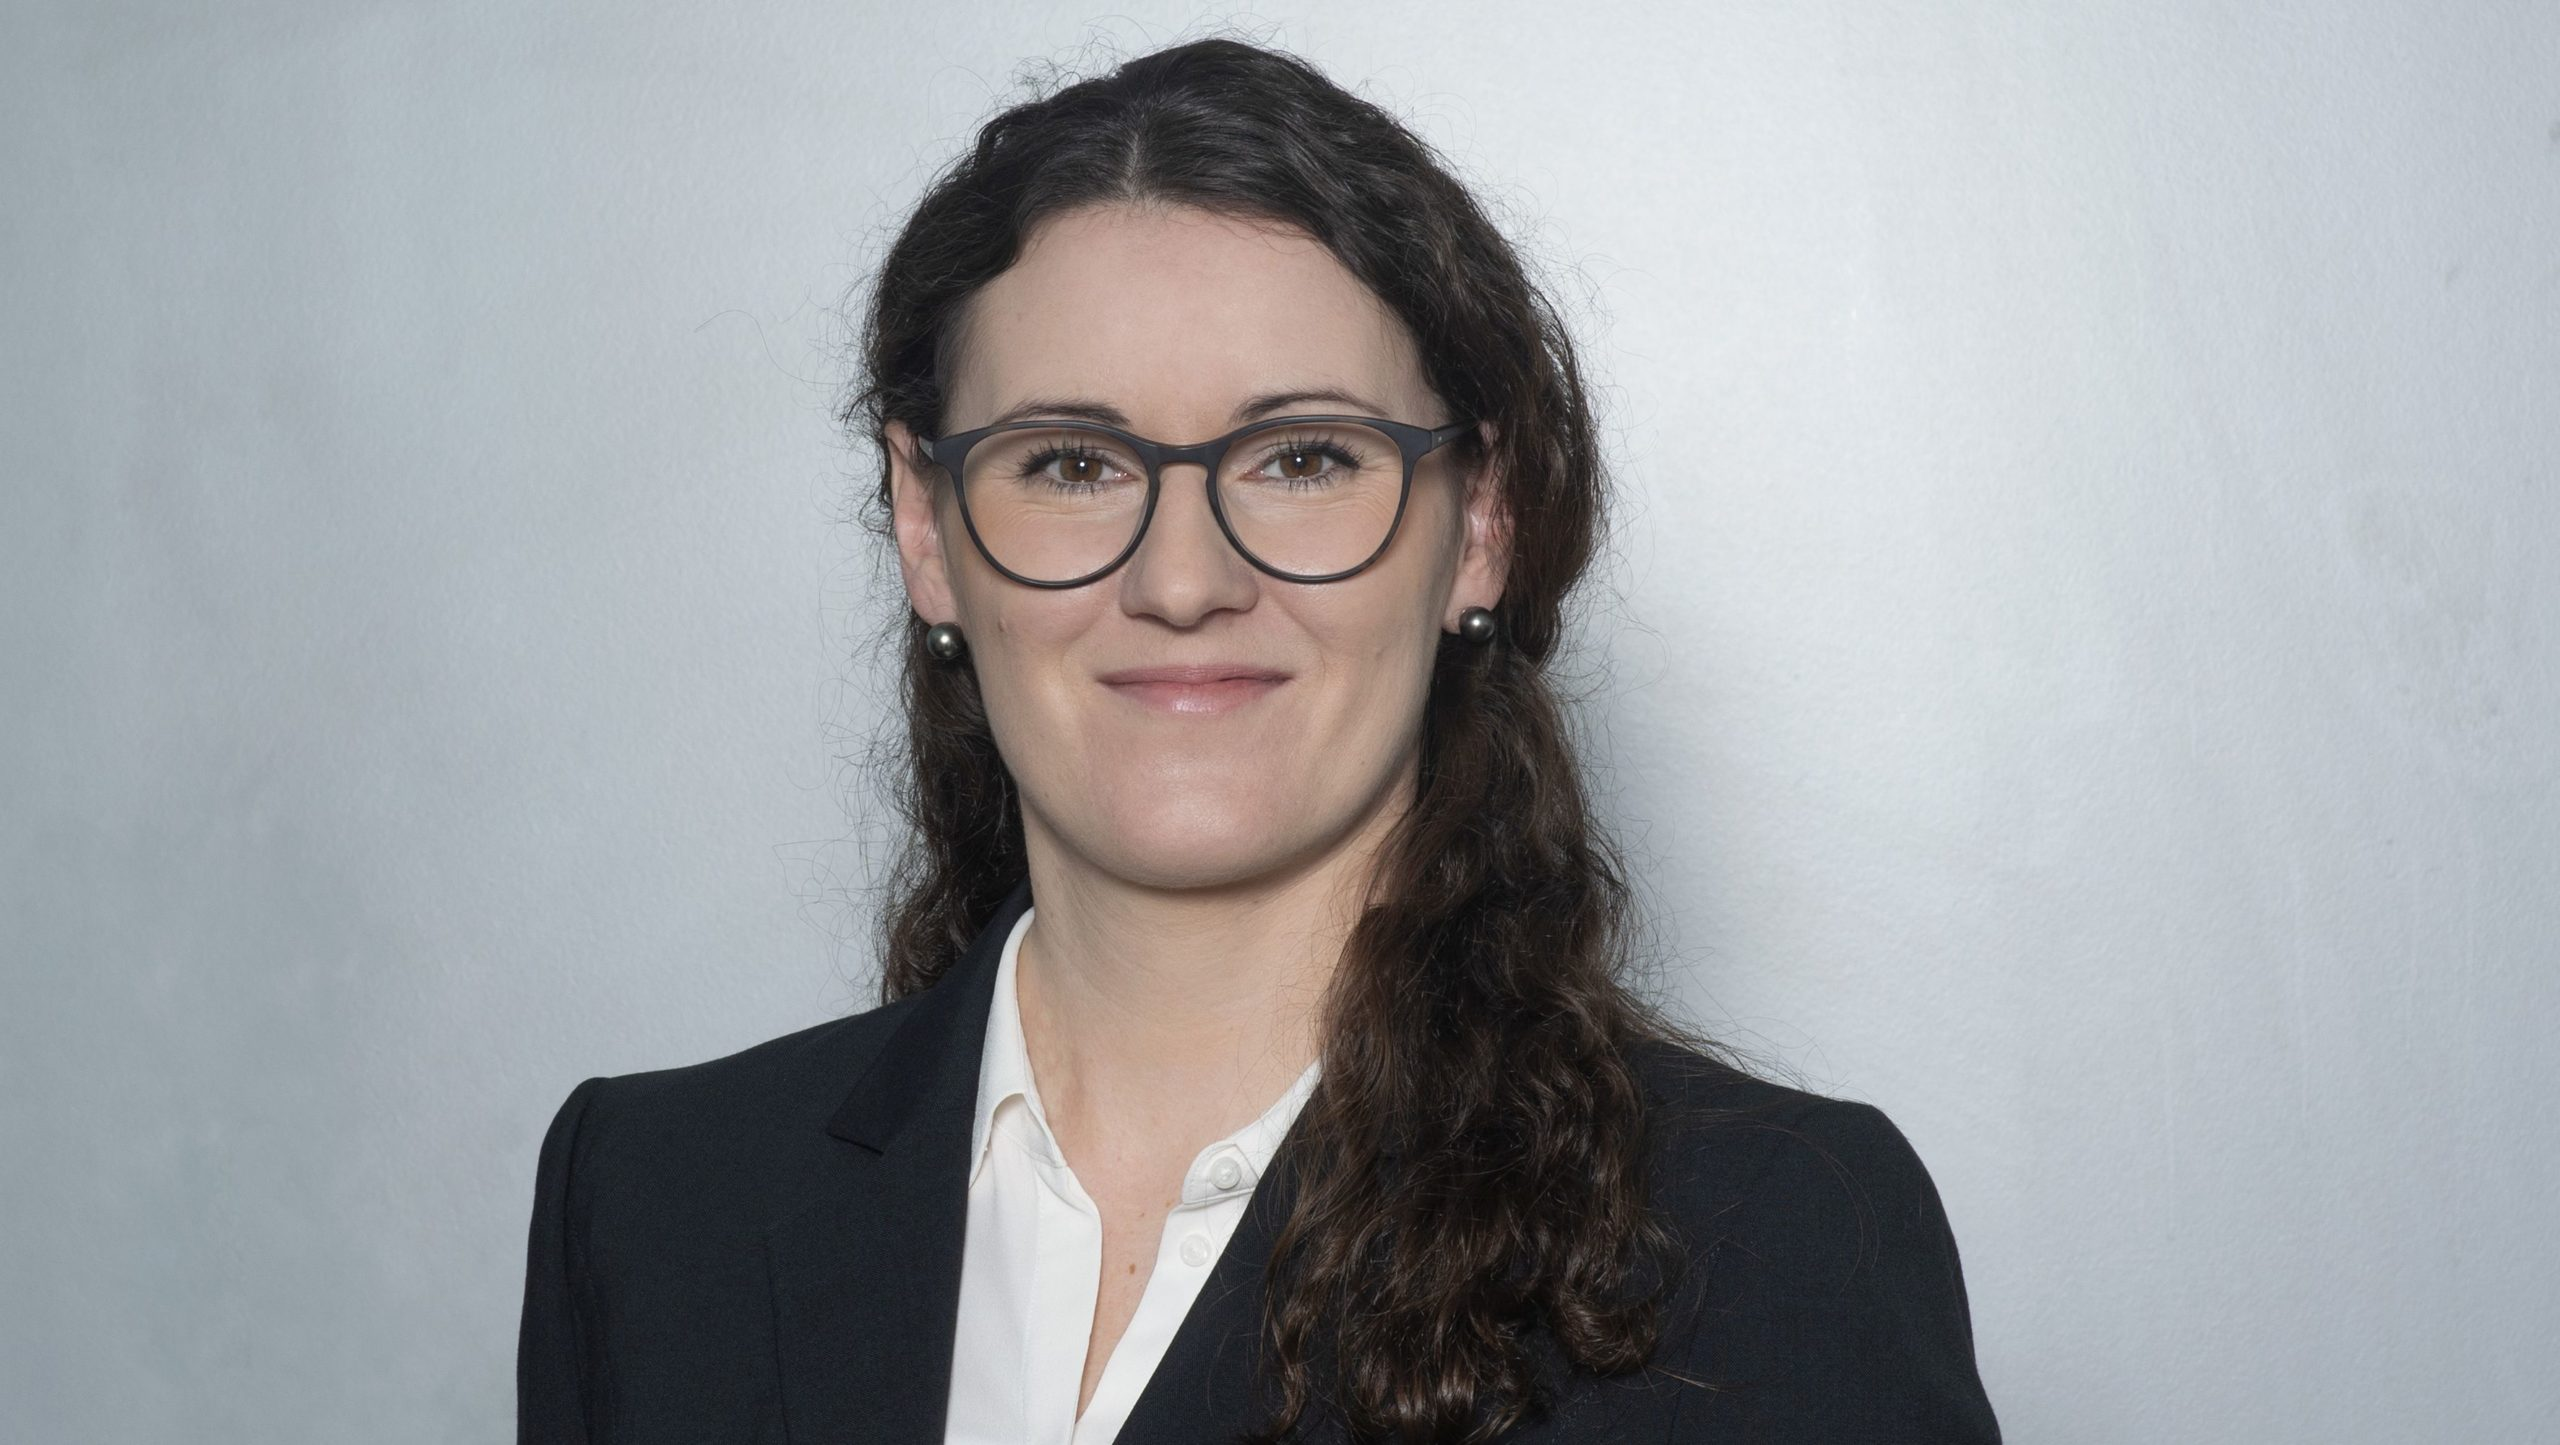 Dr. Stephanie Fiedler baut energiemeteorologische Forschung am EWI auf